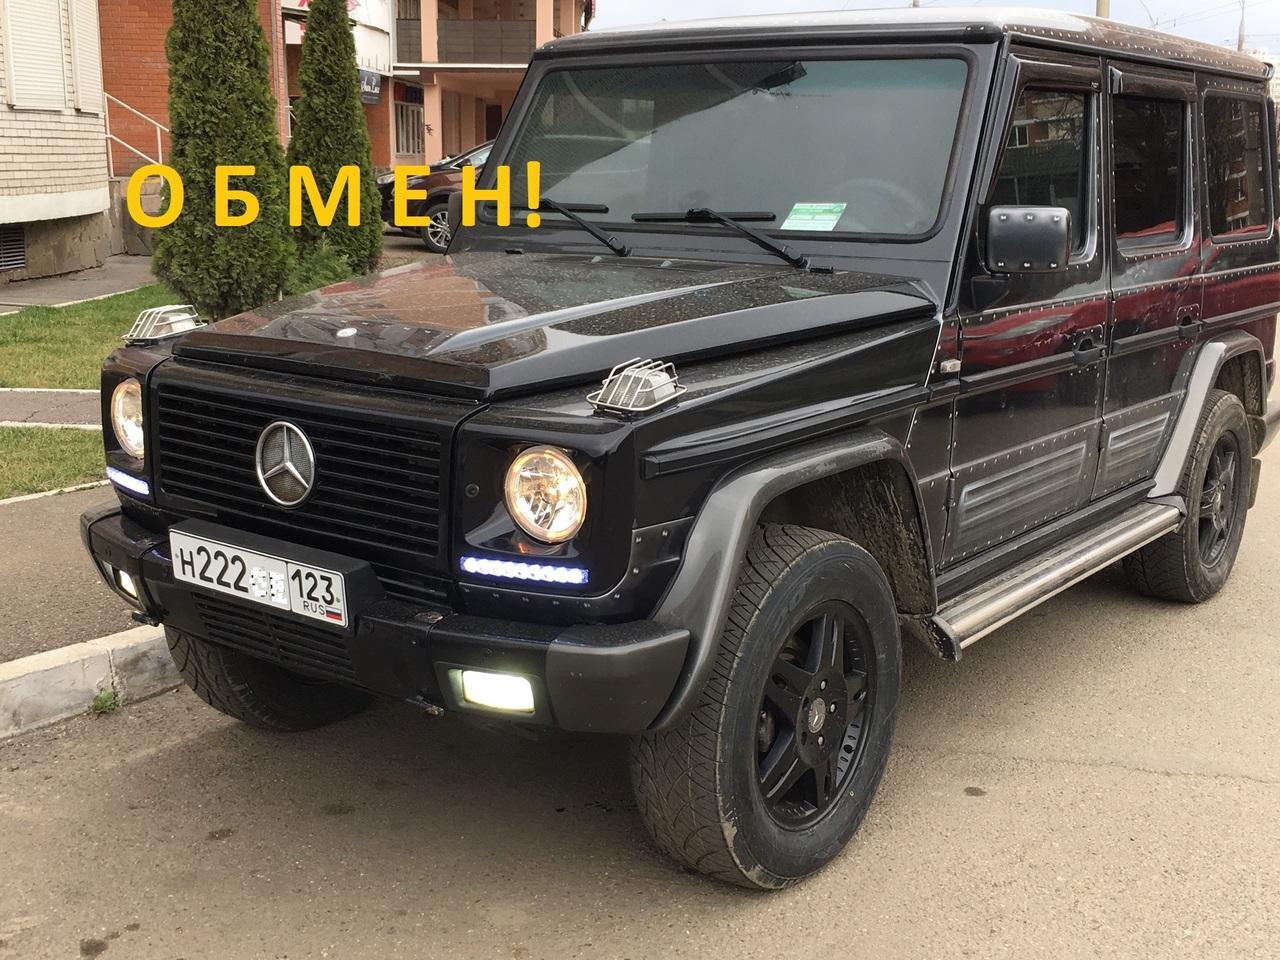 Мерседес G-класс 1996 — АНТИУАЗ:  отзыв владельца